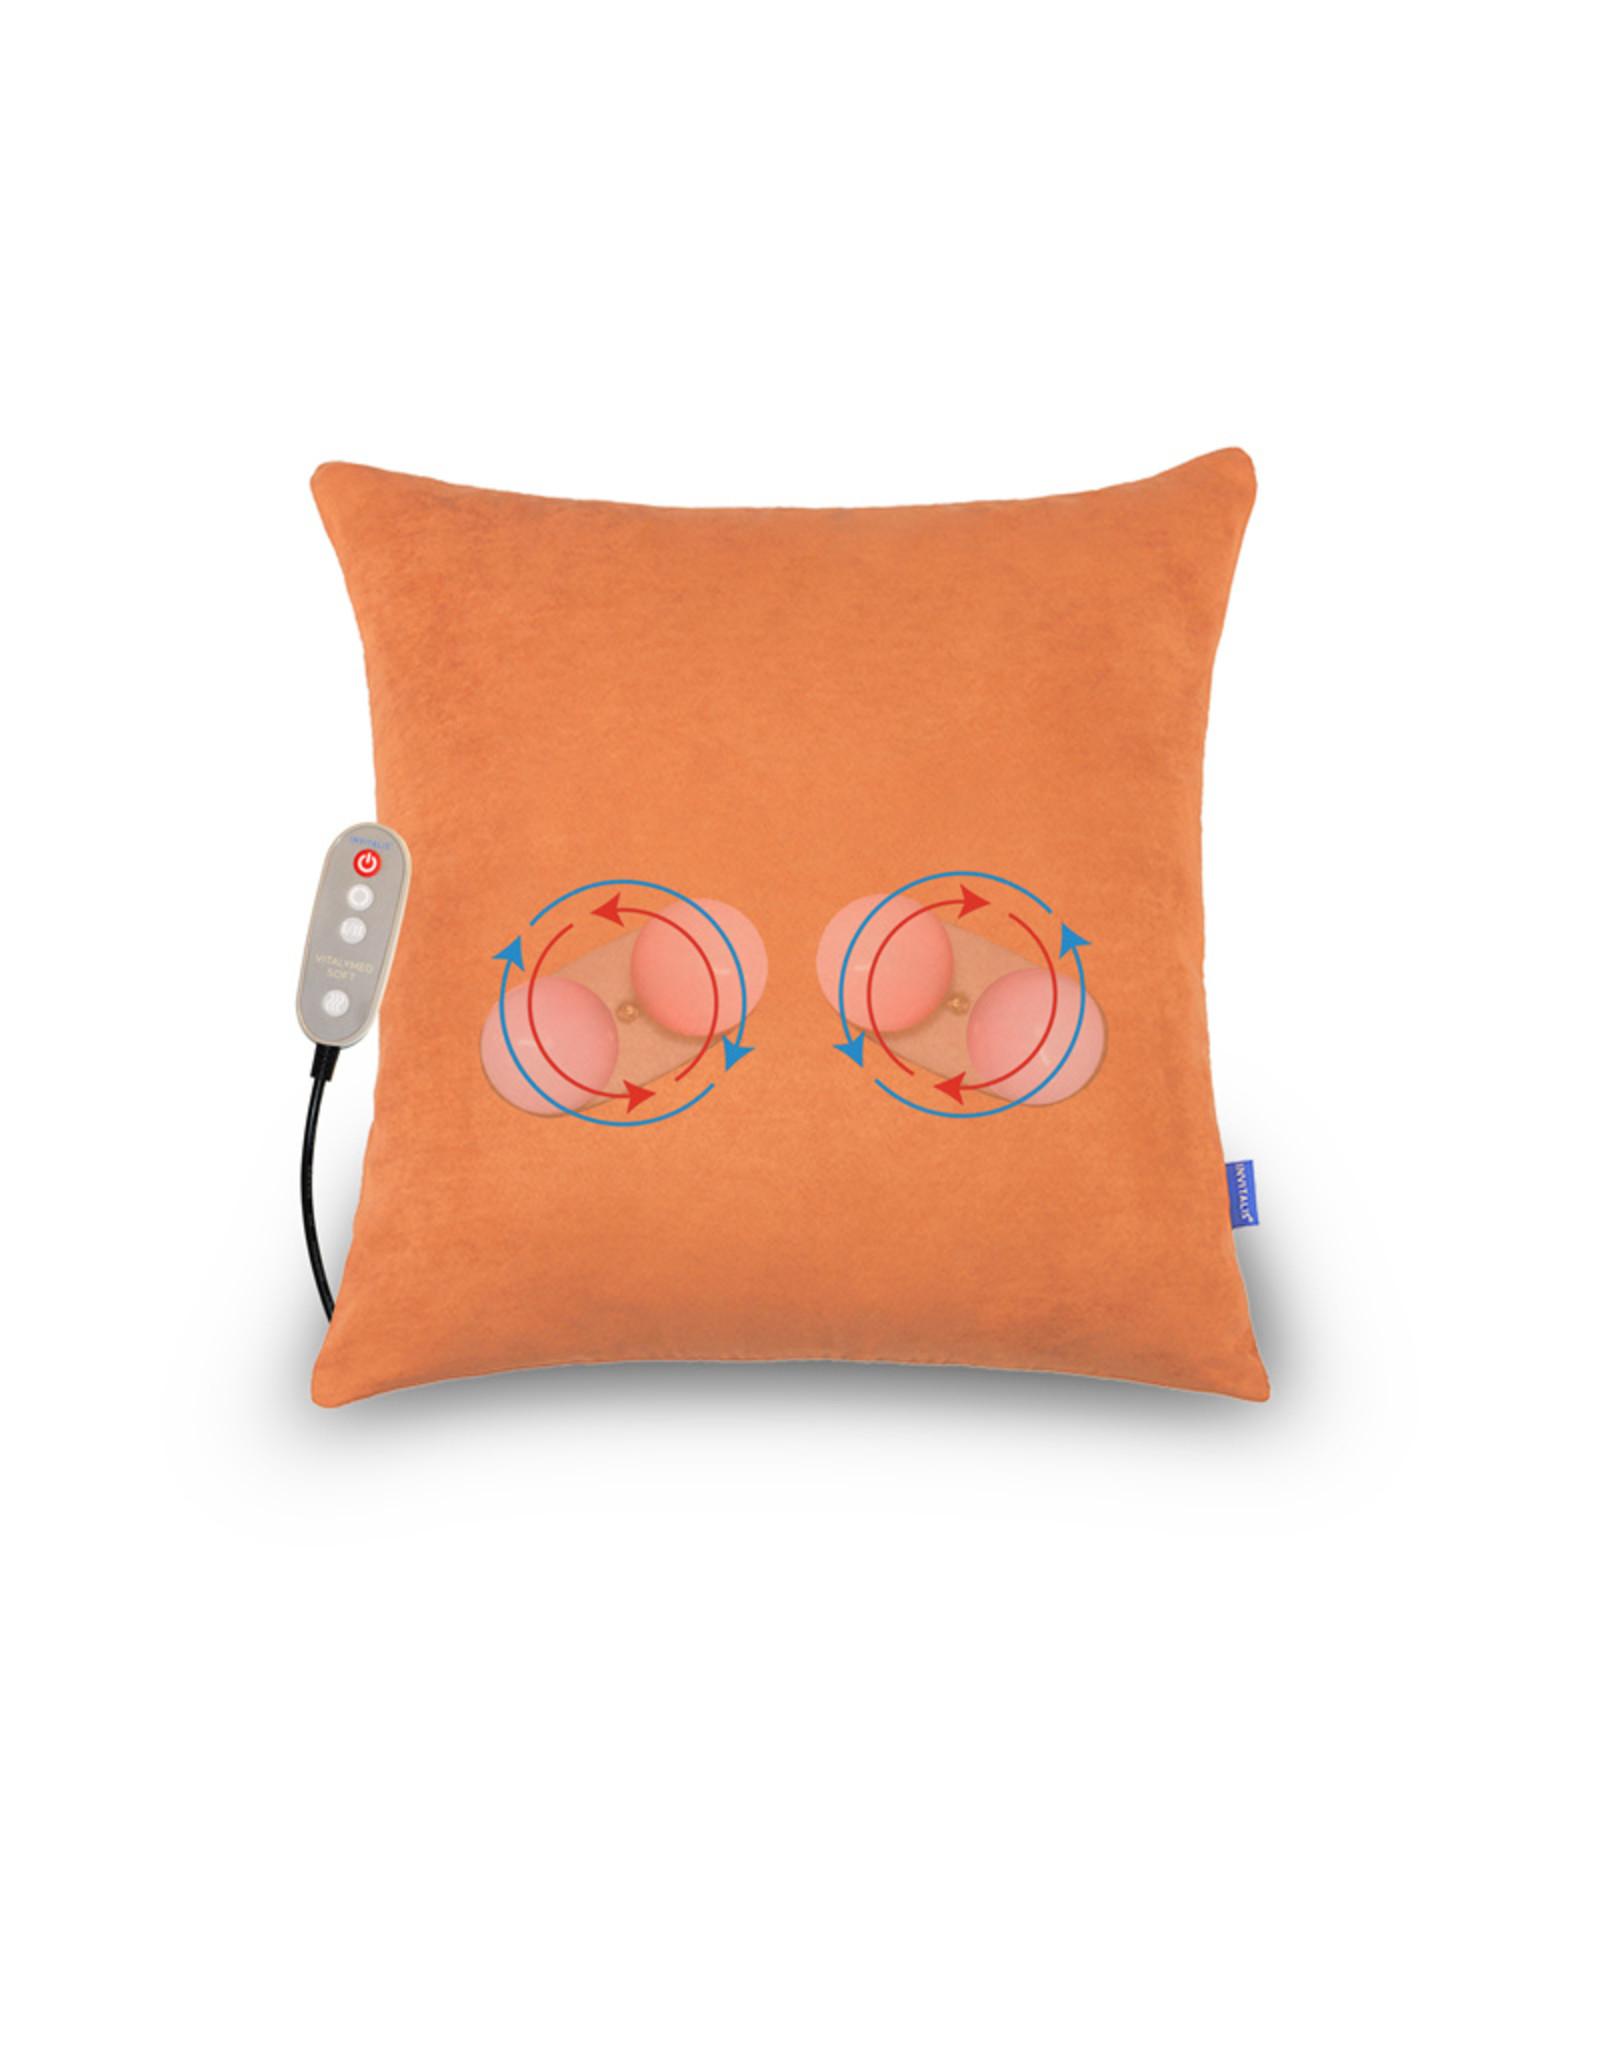 INVITALIS Vitalymed Soft - Arancione